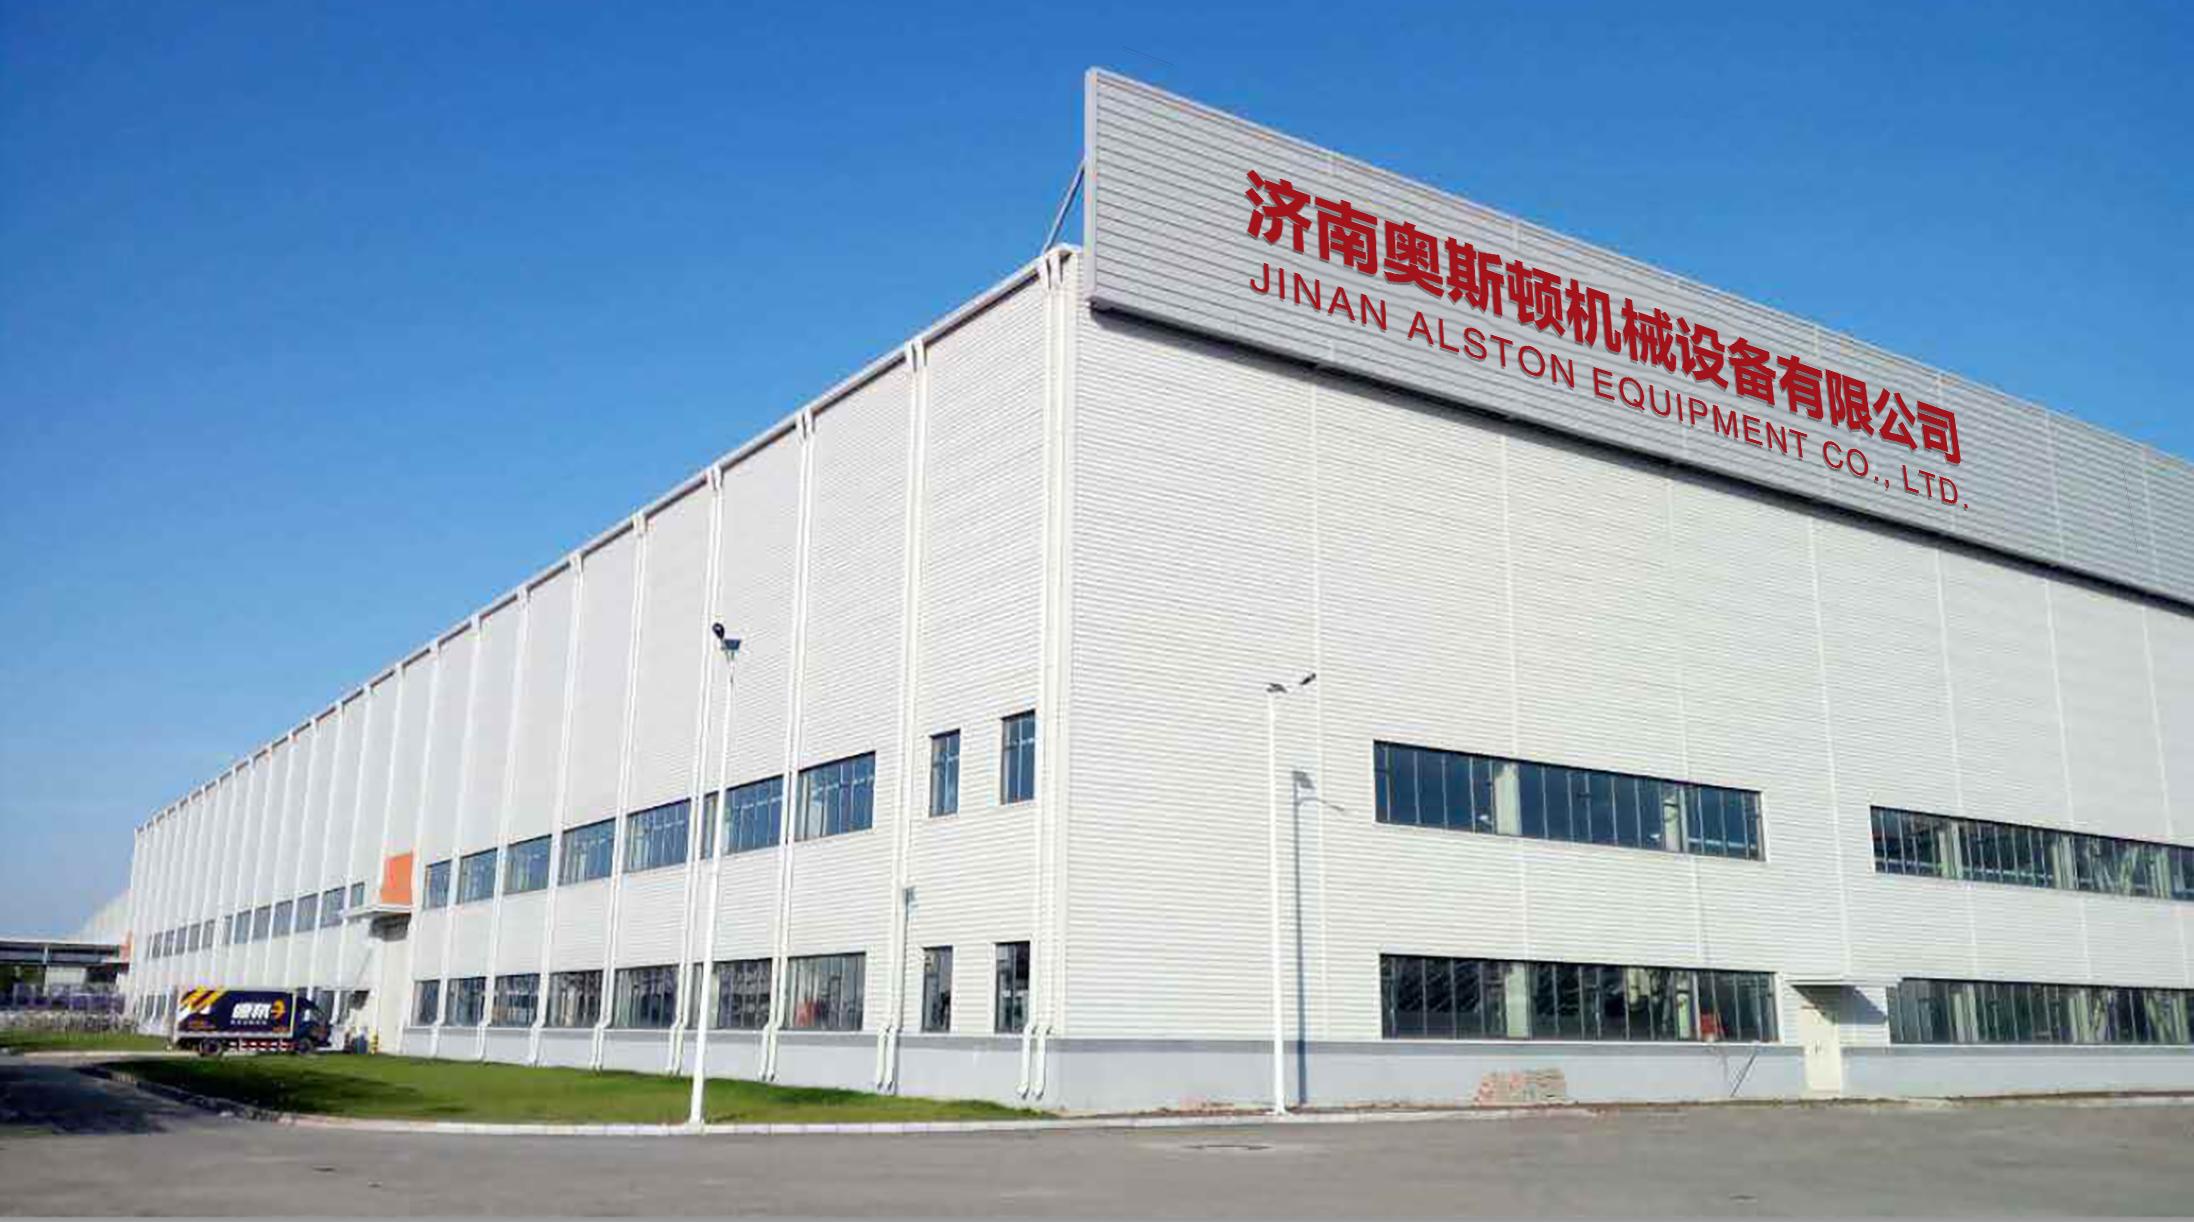 Jinan Alston Equipment Co.ltd Main Image